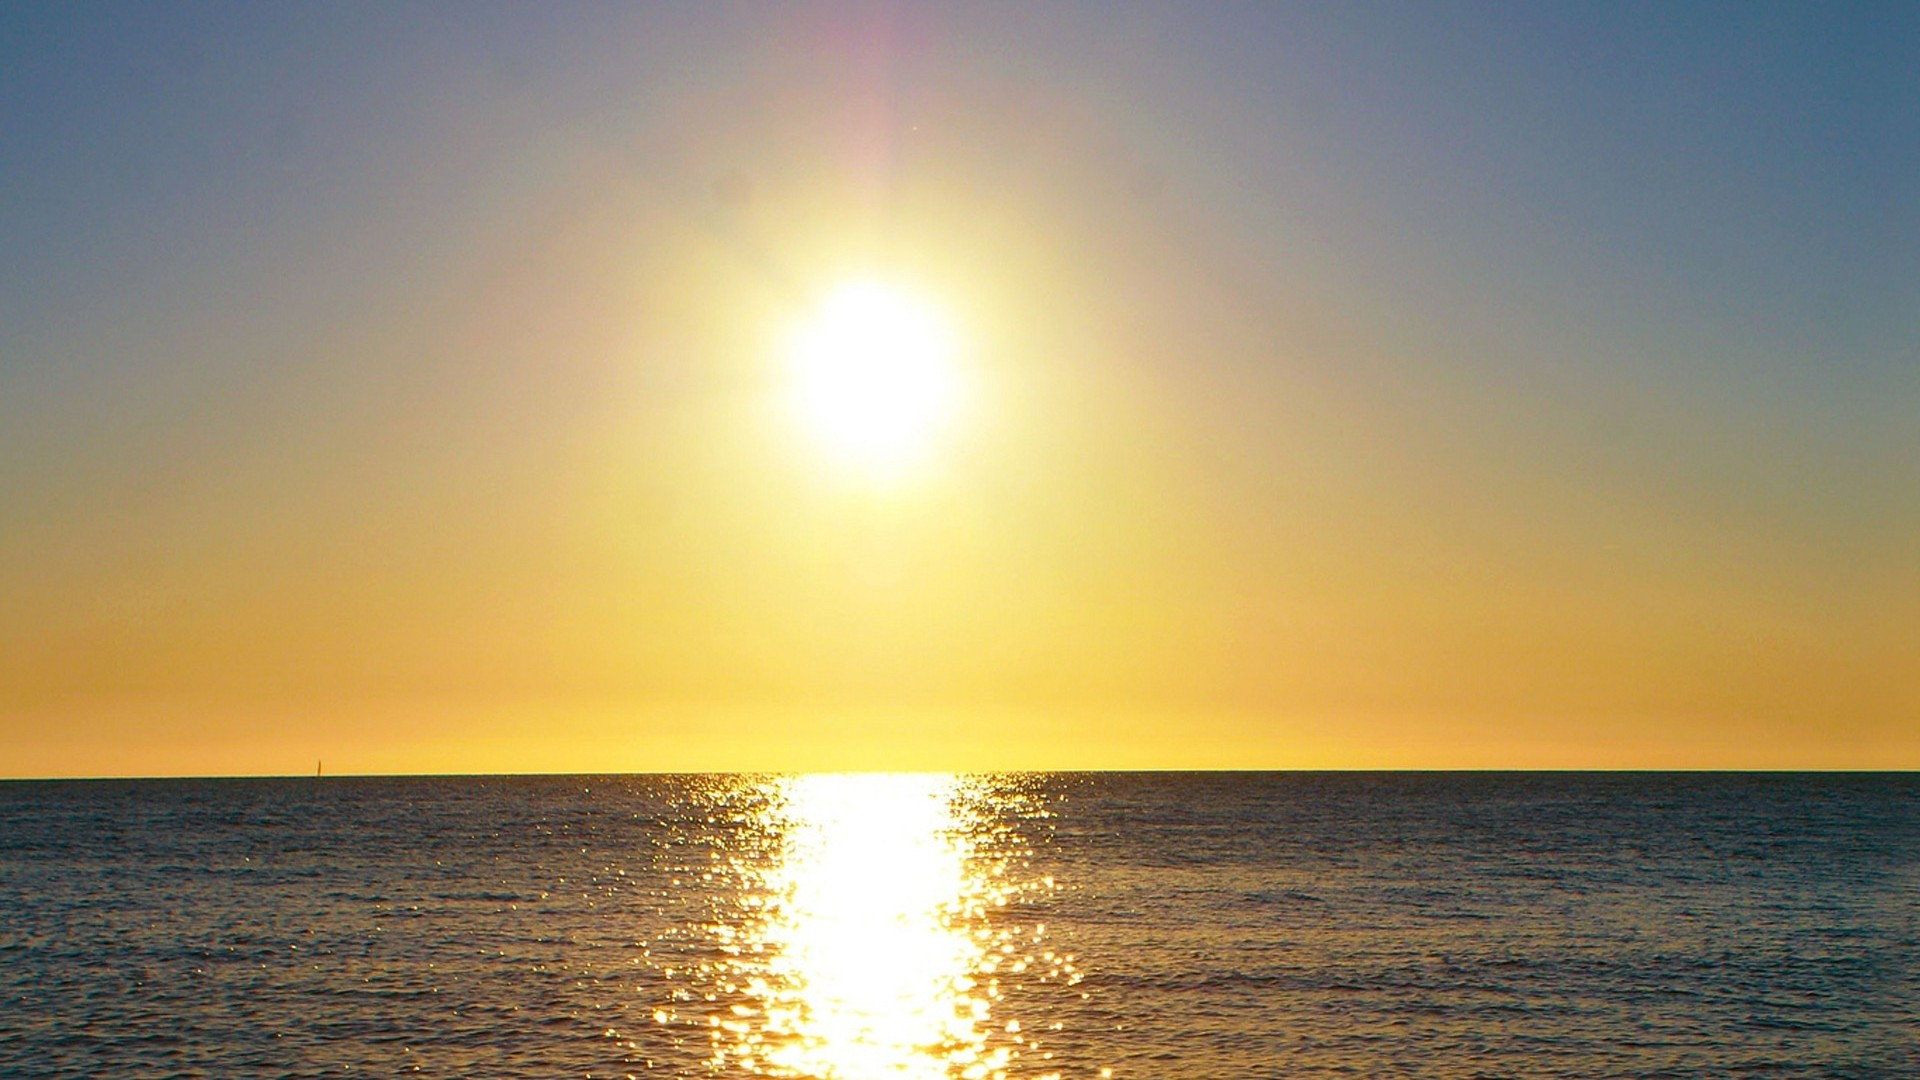 Fall Sunrise Wallpaper Sunlight Wallpaper 1920x1080 68961